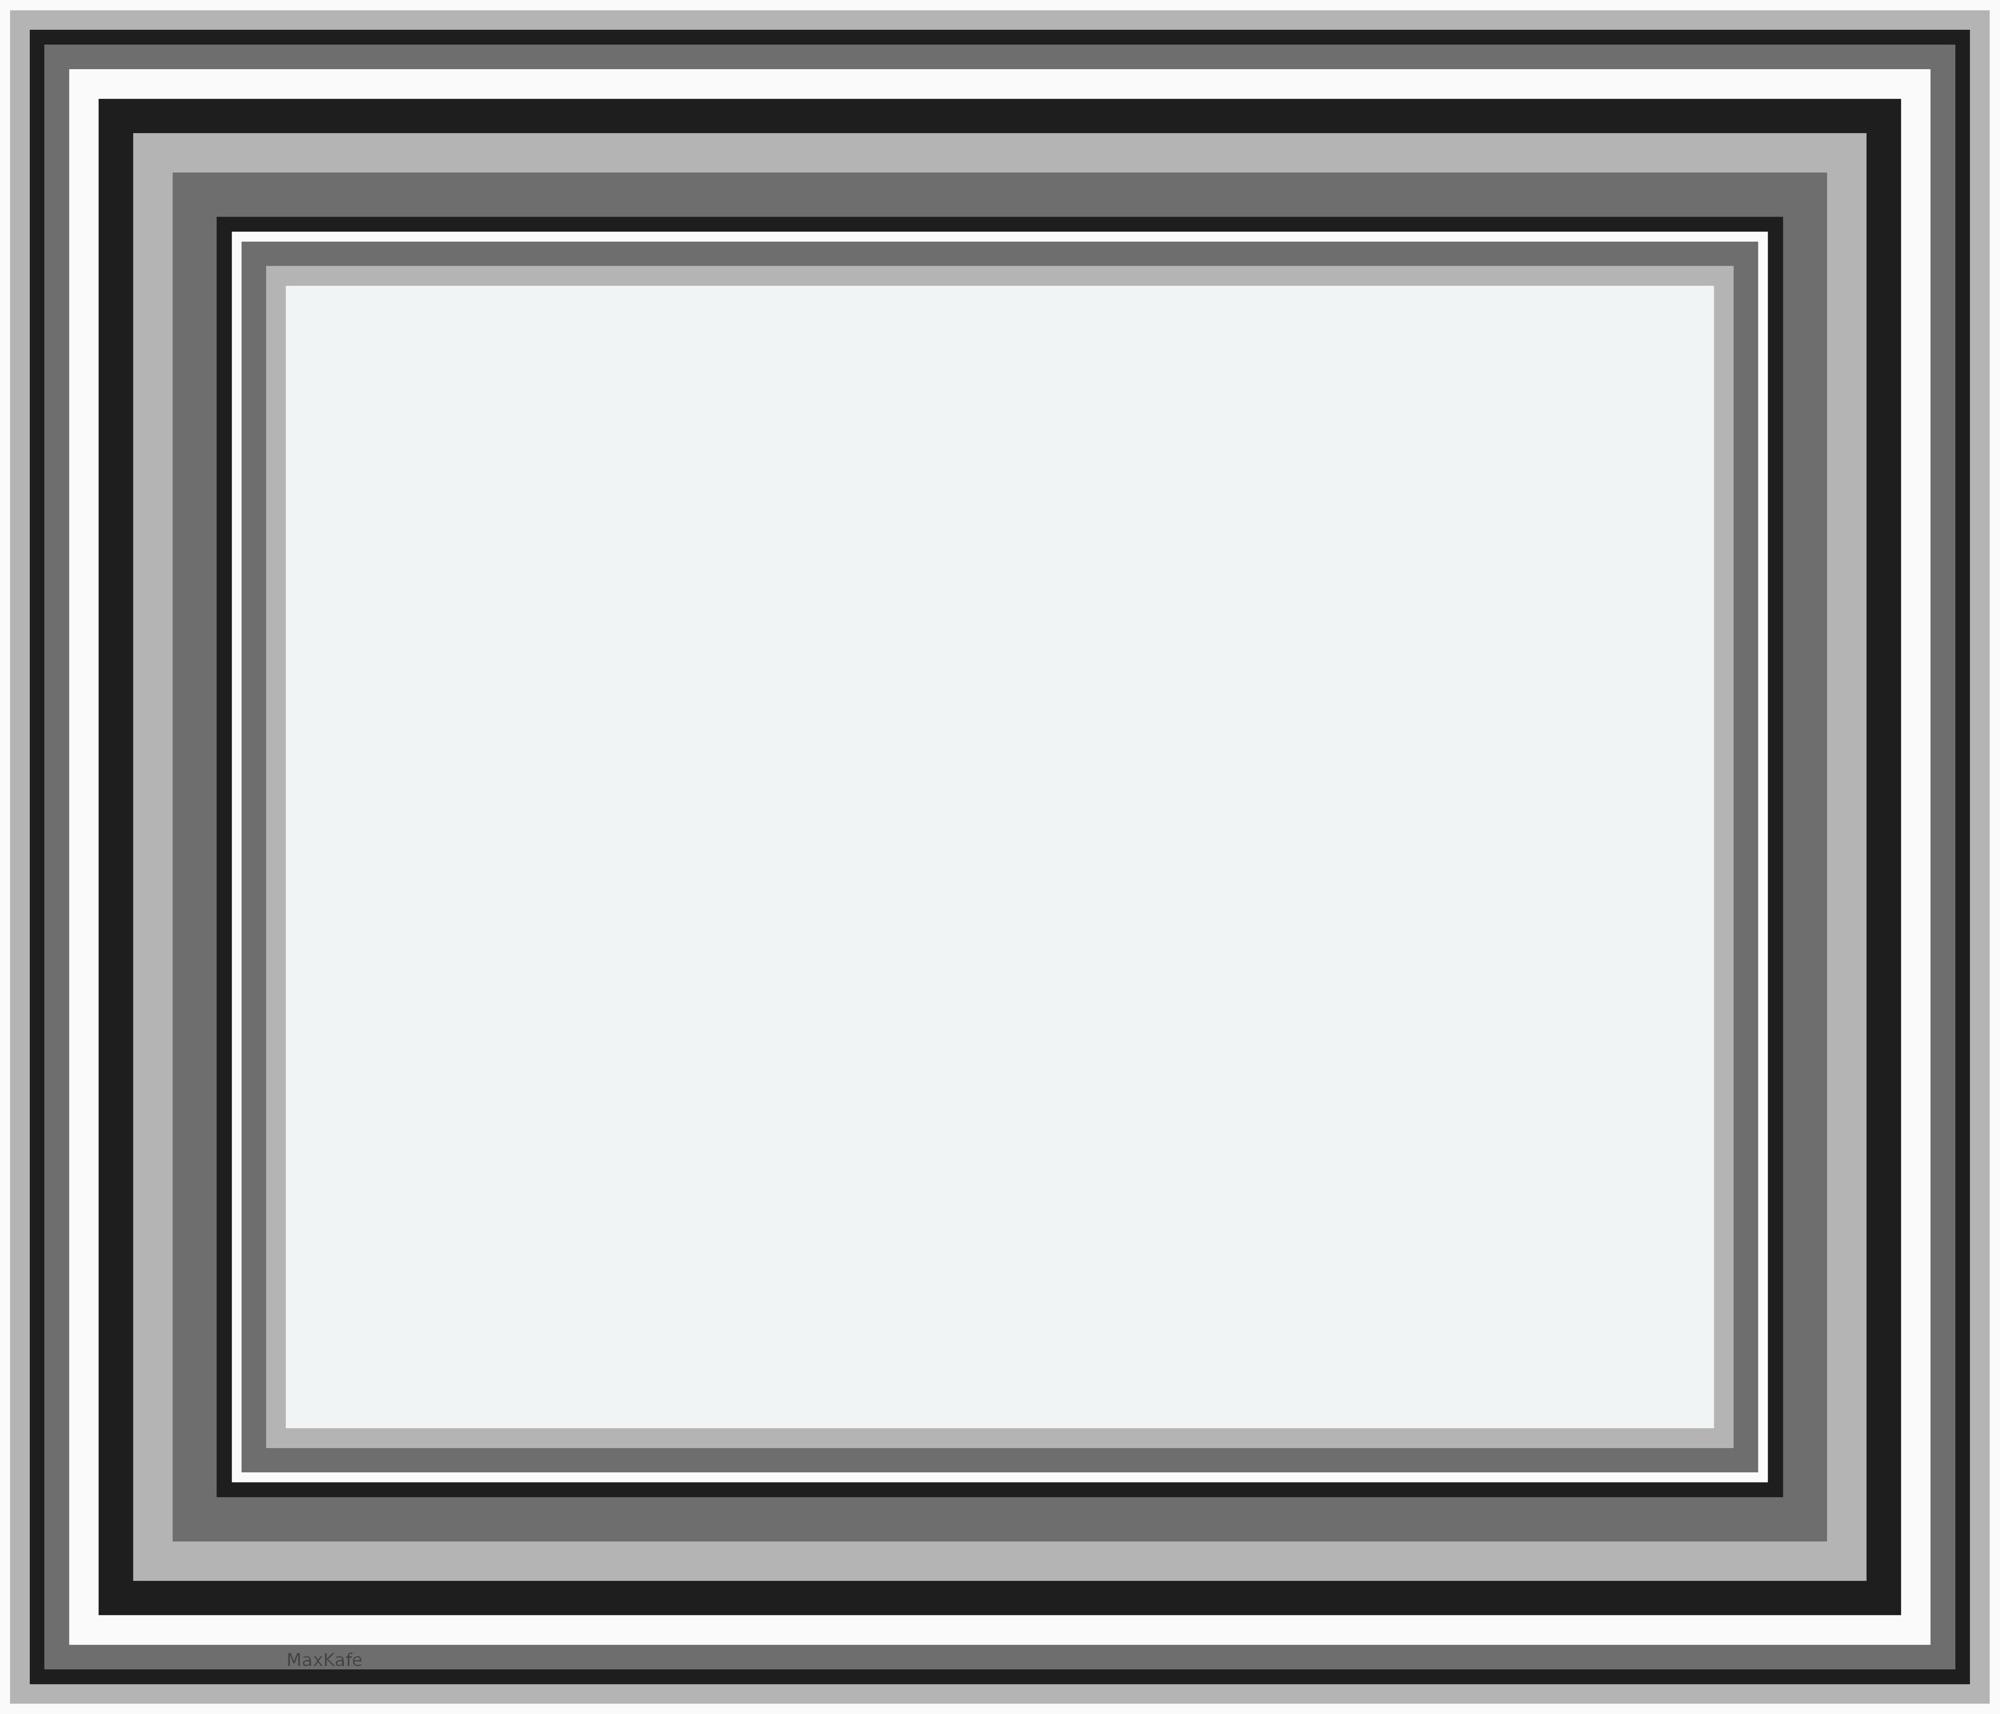 "MK16LFS102 Frame 6x7 Gray <a href=""https://dl.orangedox.com/i9GSr1"">[DOWNLOAD]</a>"